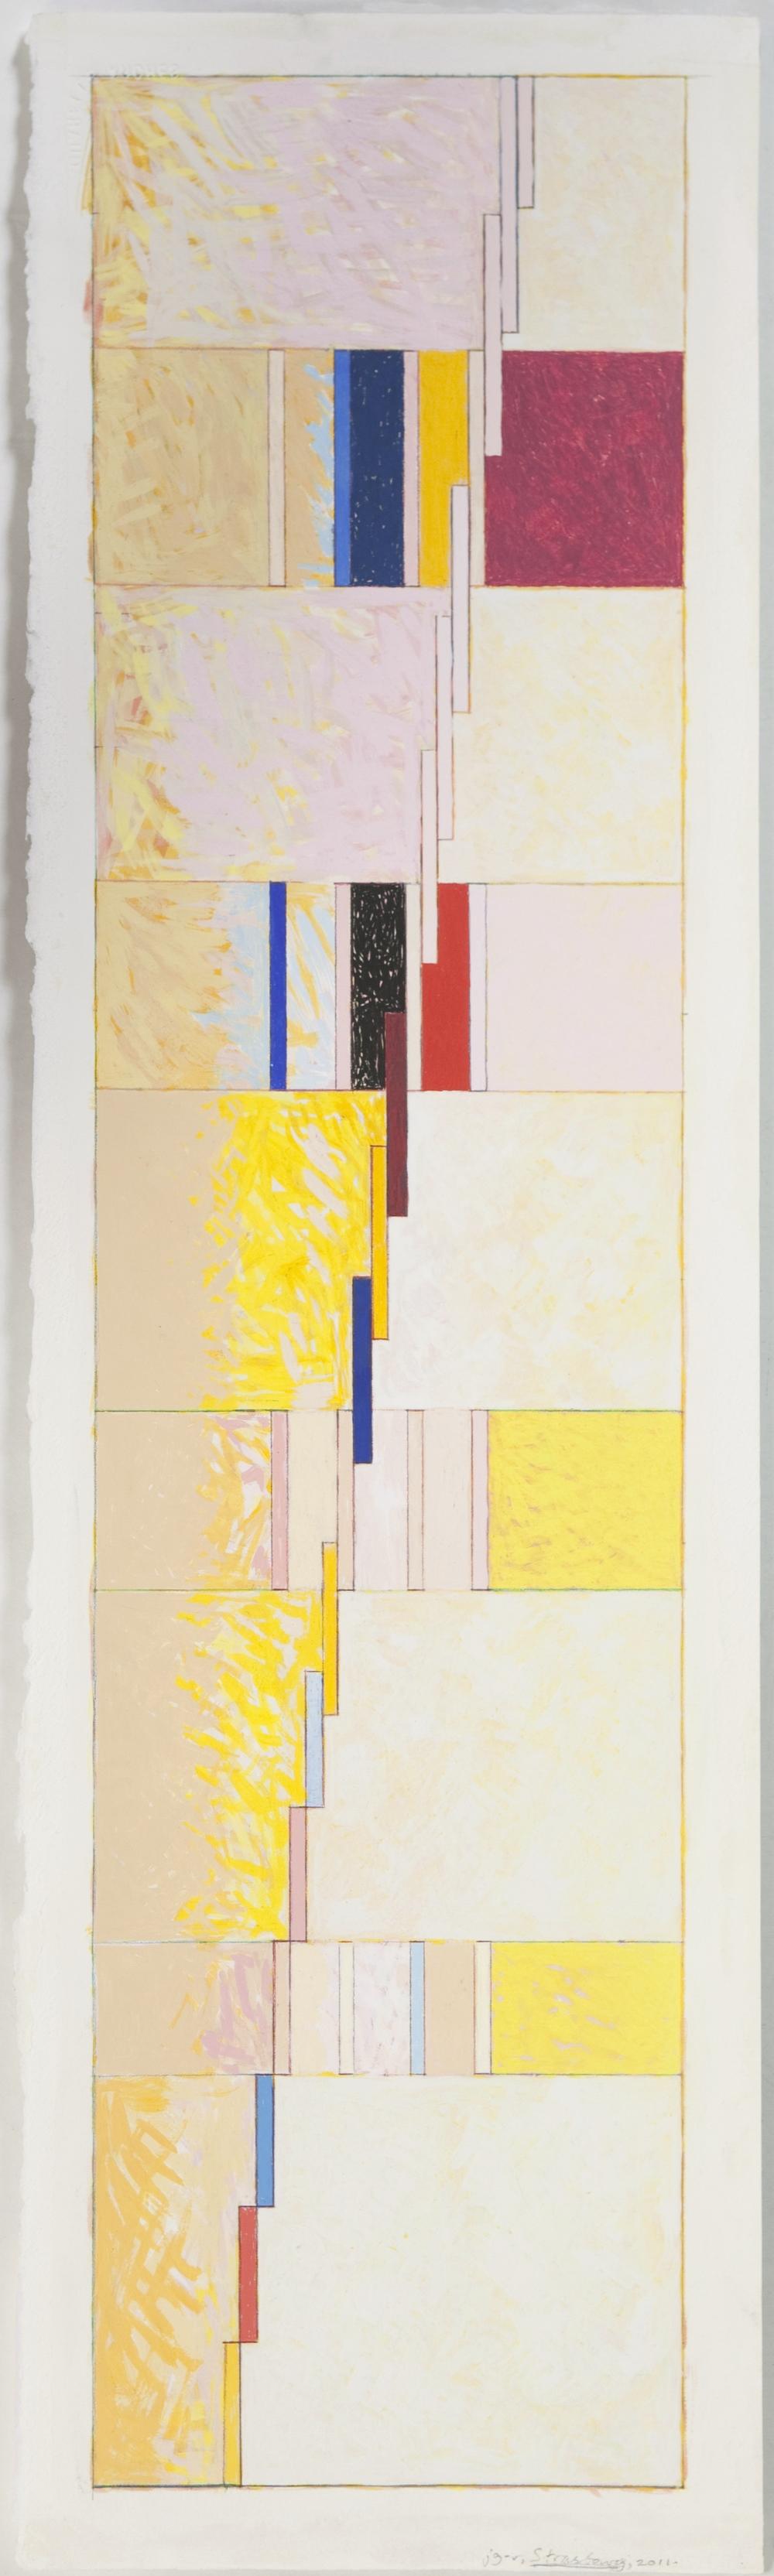 "Strasbourg, 2011, gouache on paper, 28 1/2""x7 1/4"""